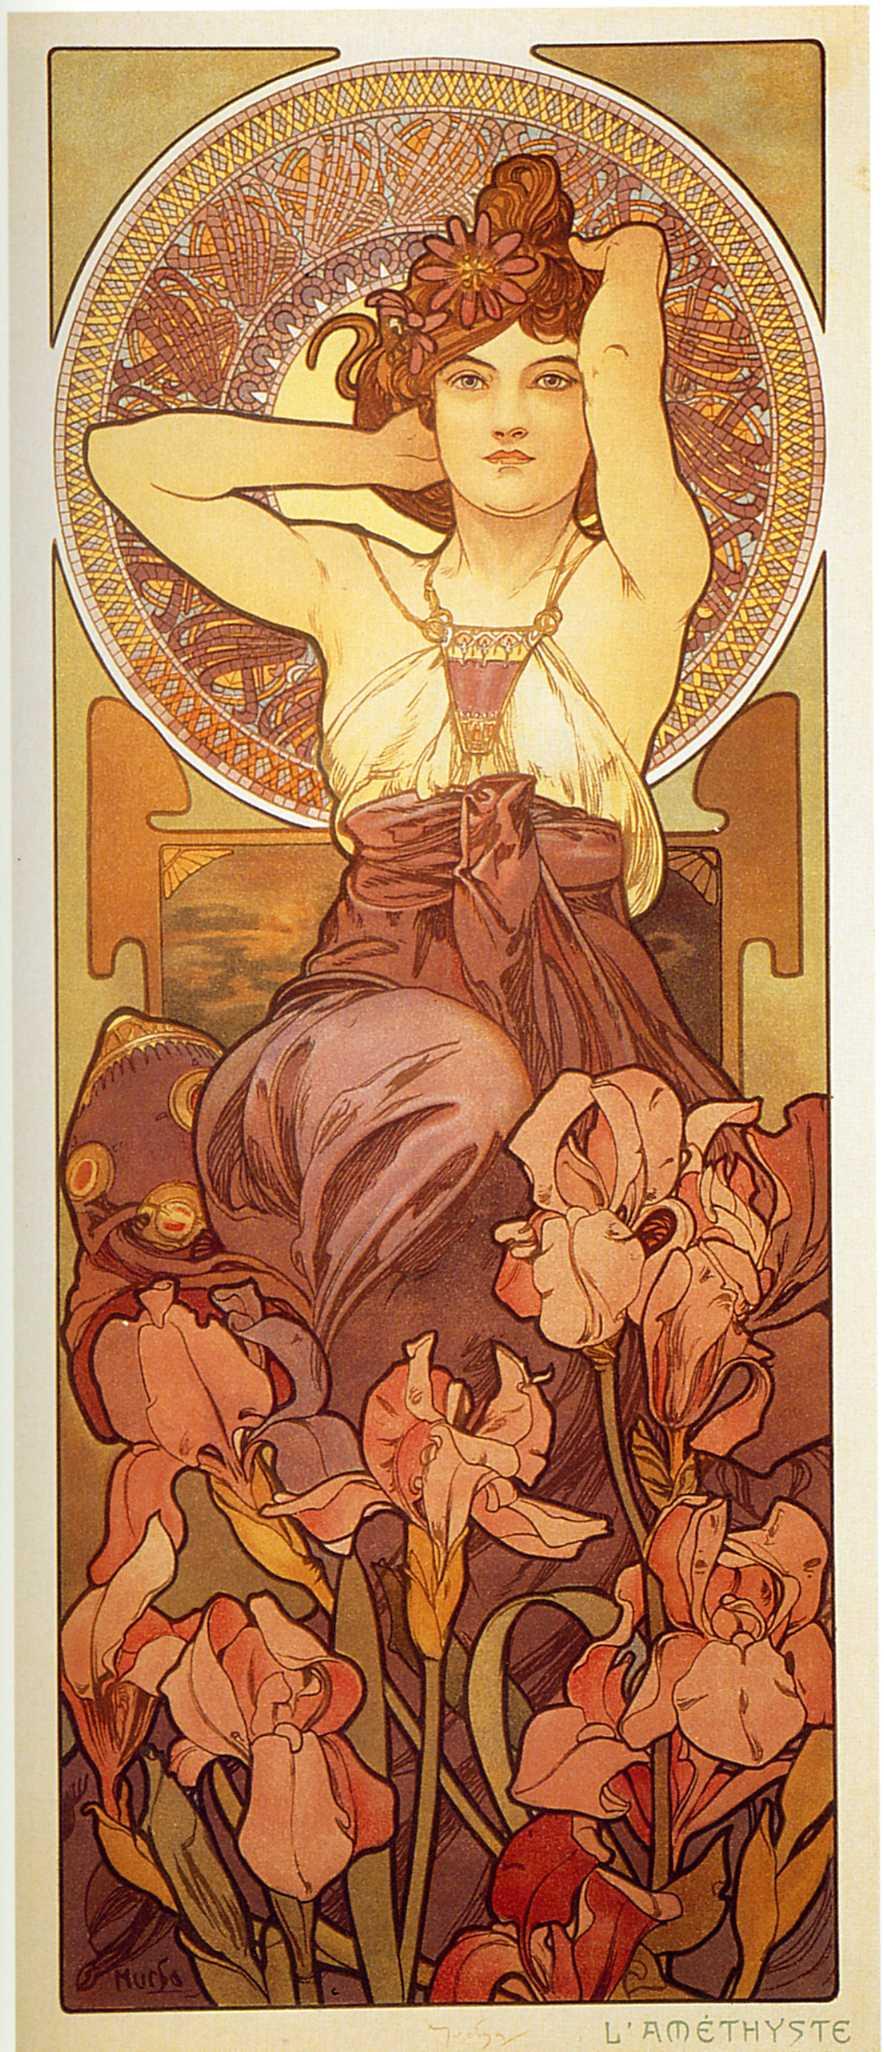 A study on art nouveau